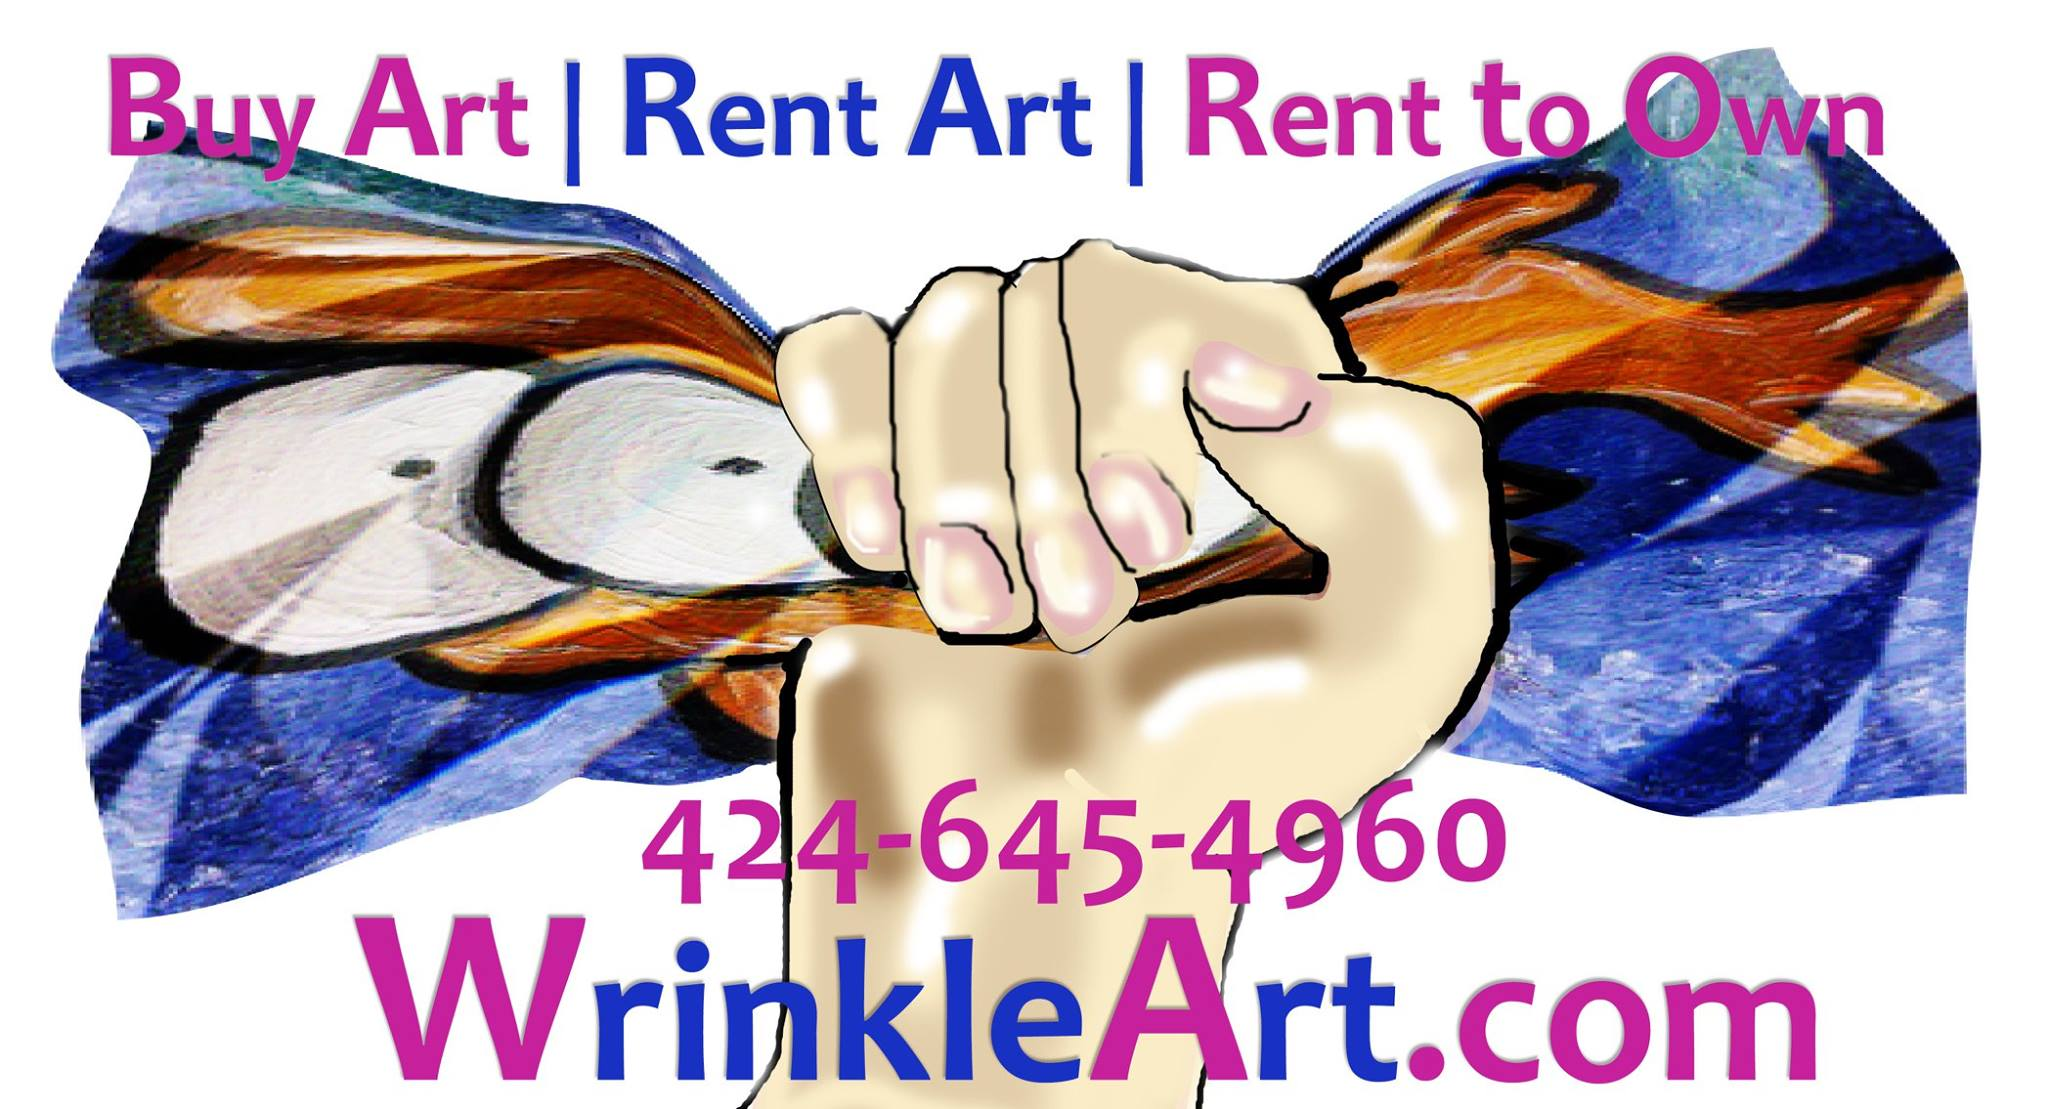 Shop Wrinkle Art online